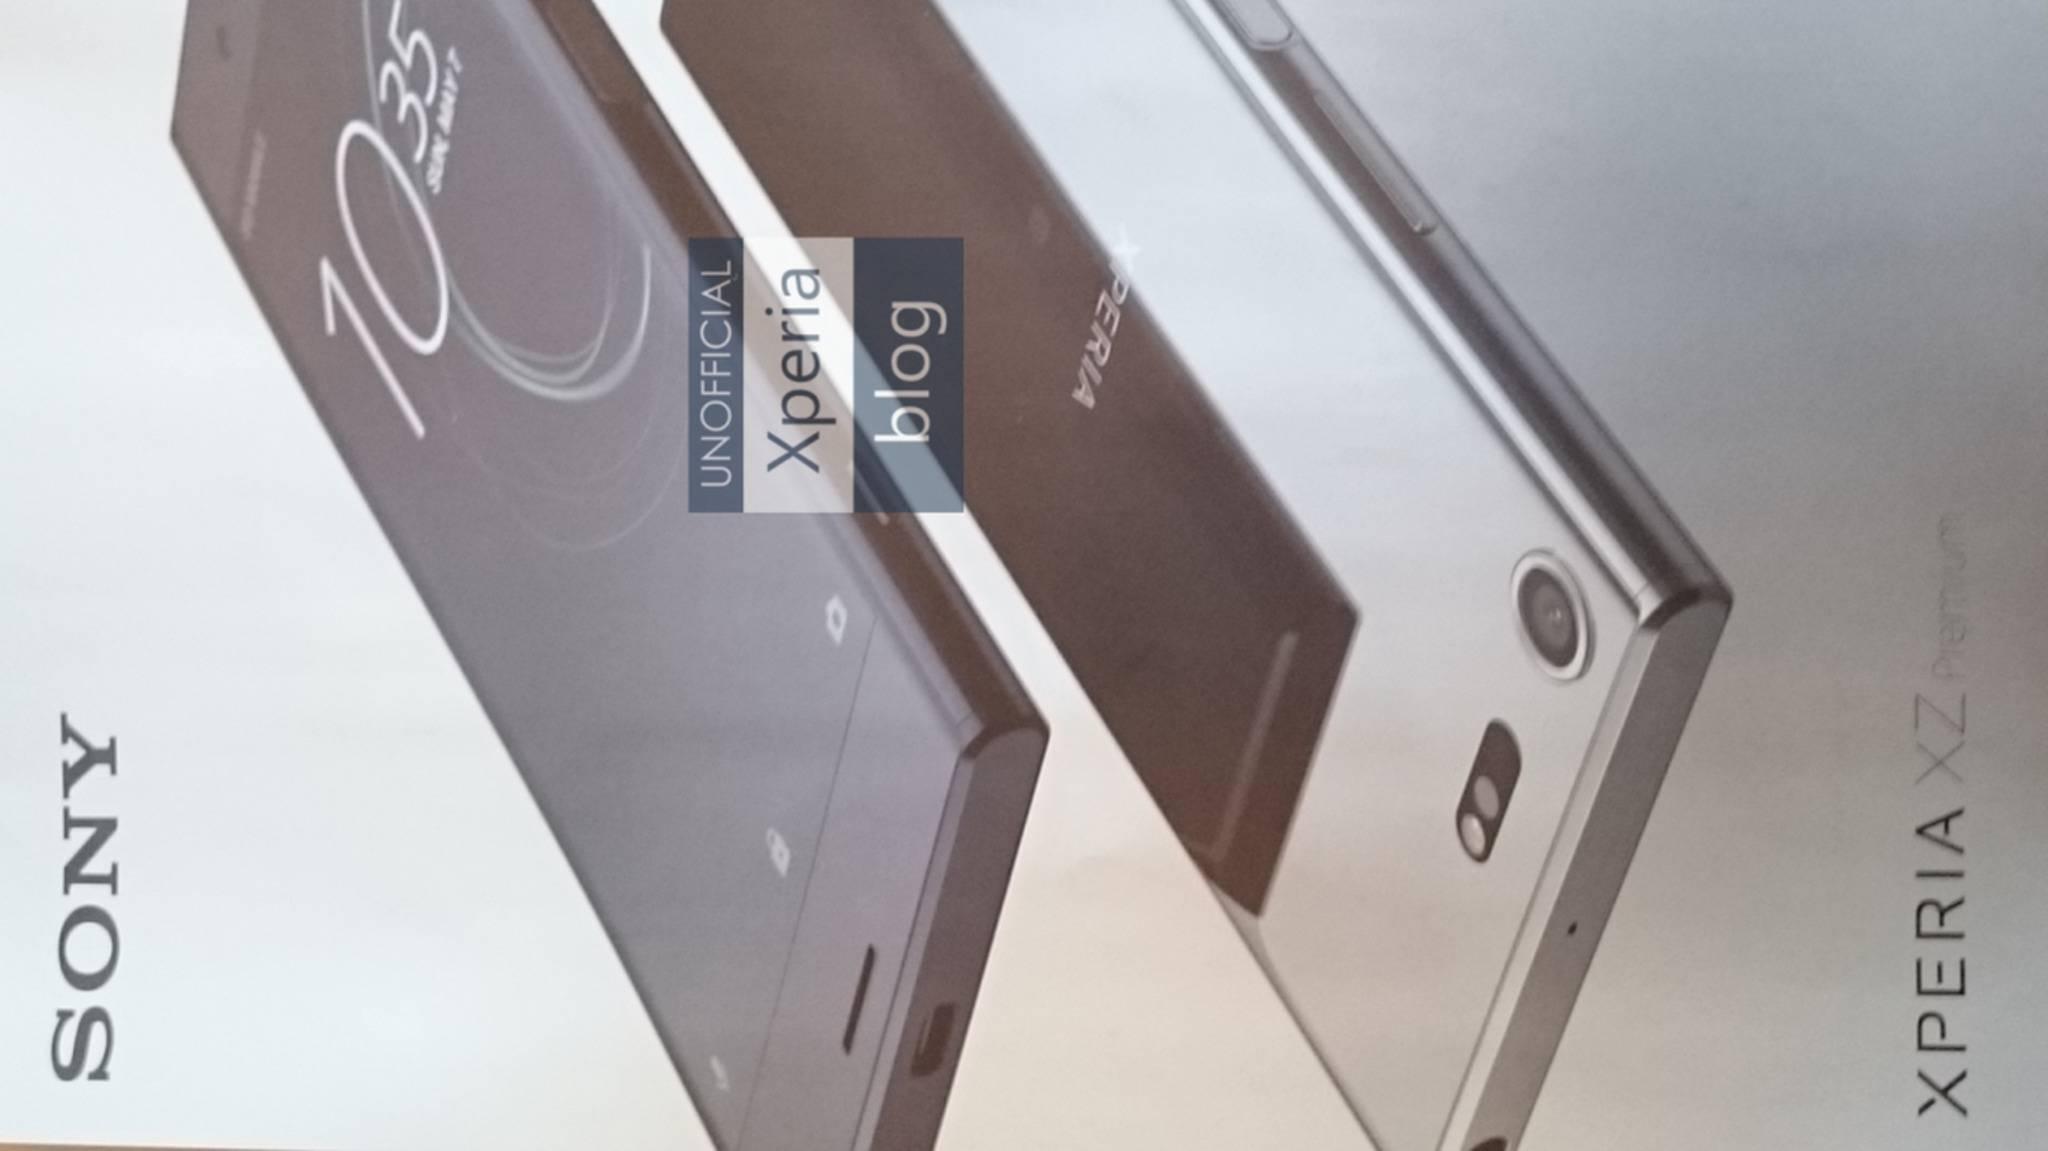 Das Sony Xperia XZ Premium soll ein 4K HDR-Display bieten.